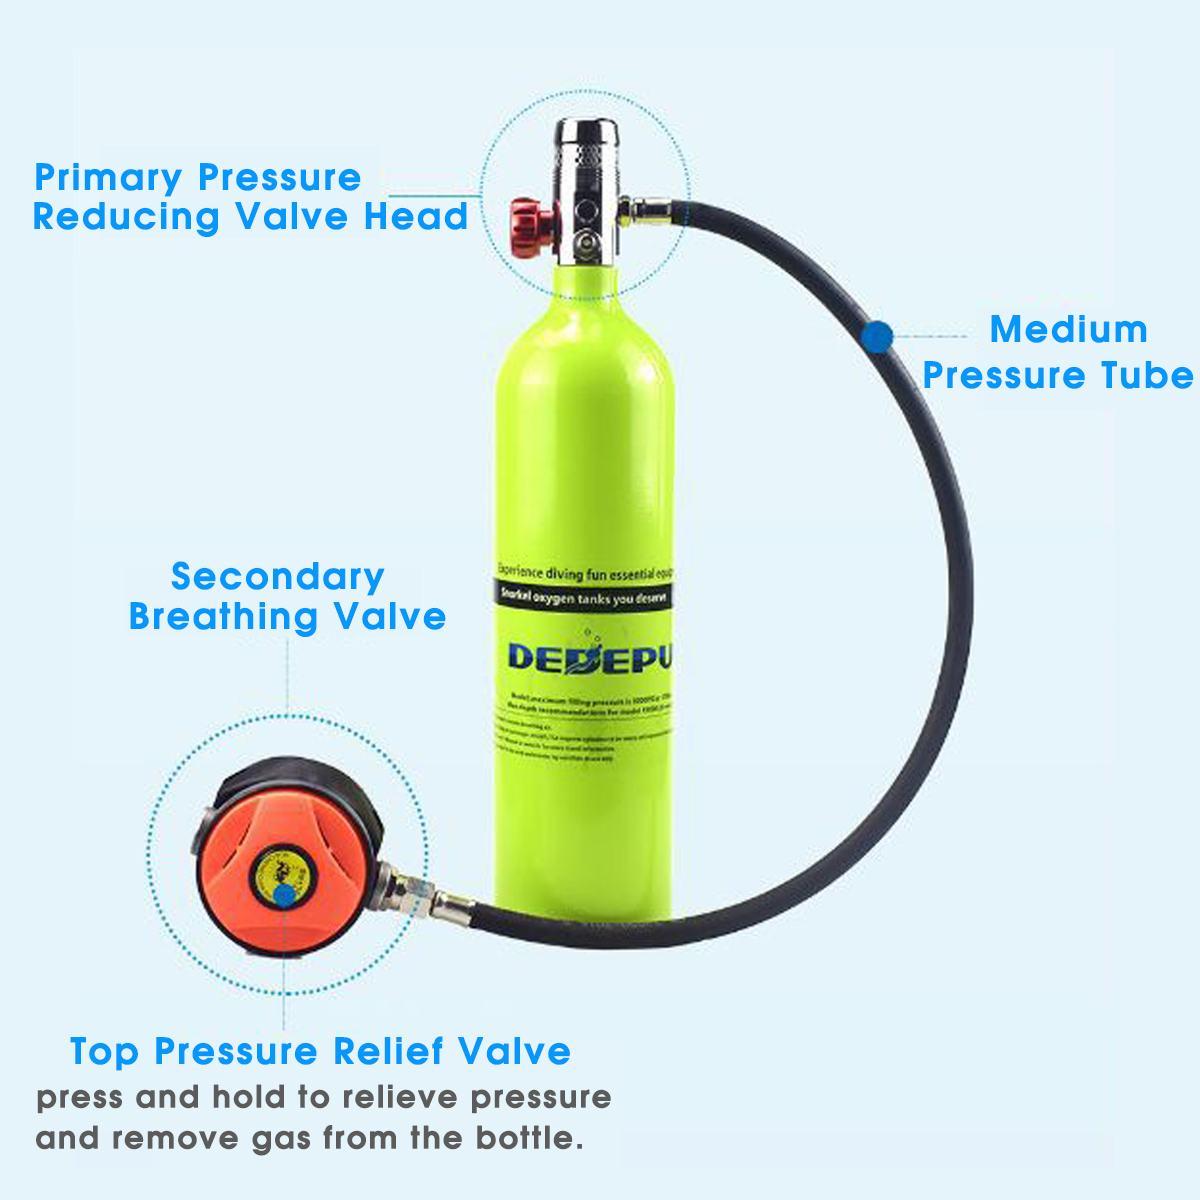 Equipo de Buceo 1L, cilindro de buceo, tanque de oxígeno, respirador, adaptador de repuesto, bomba de alta presión, accesorios de respiración de buceo - 3